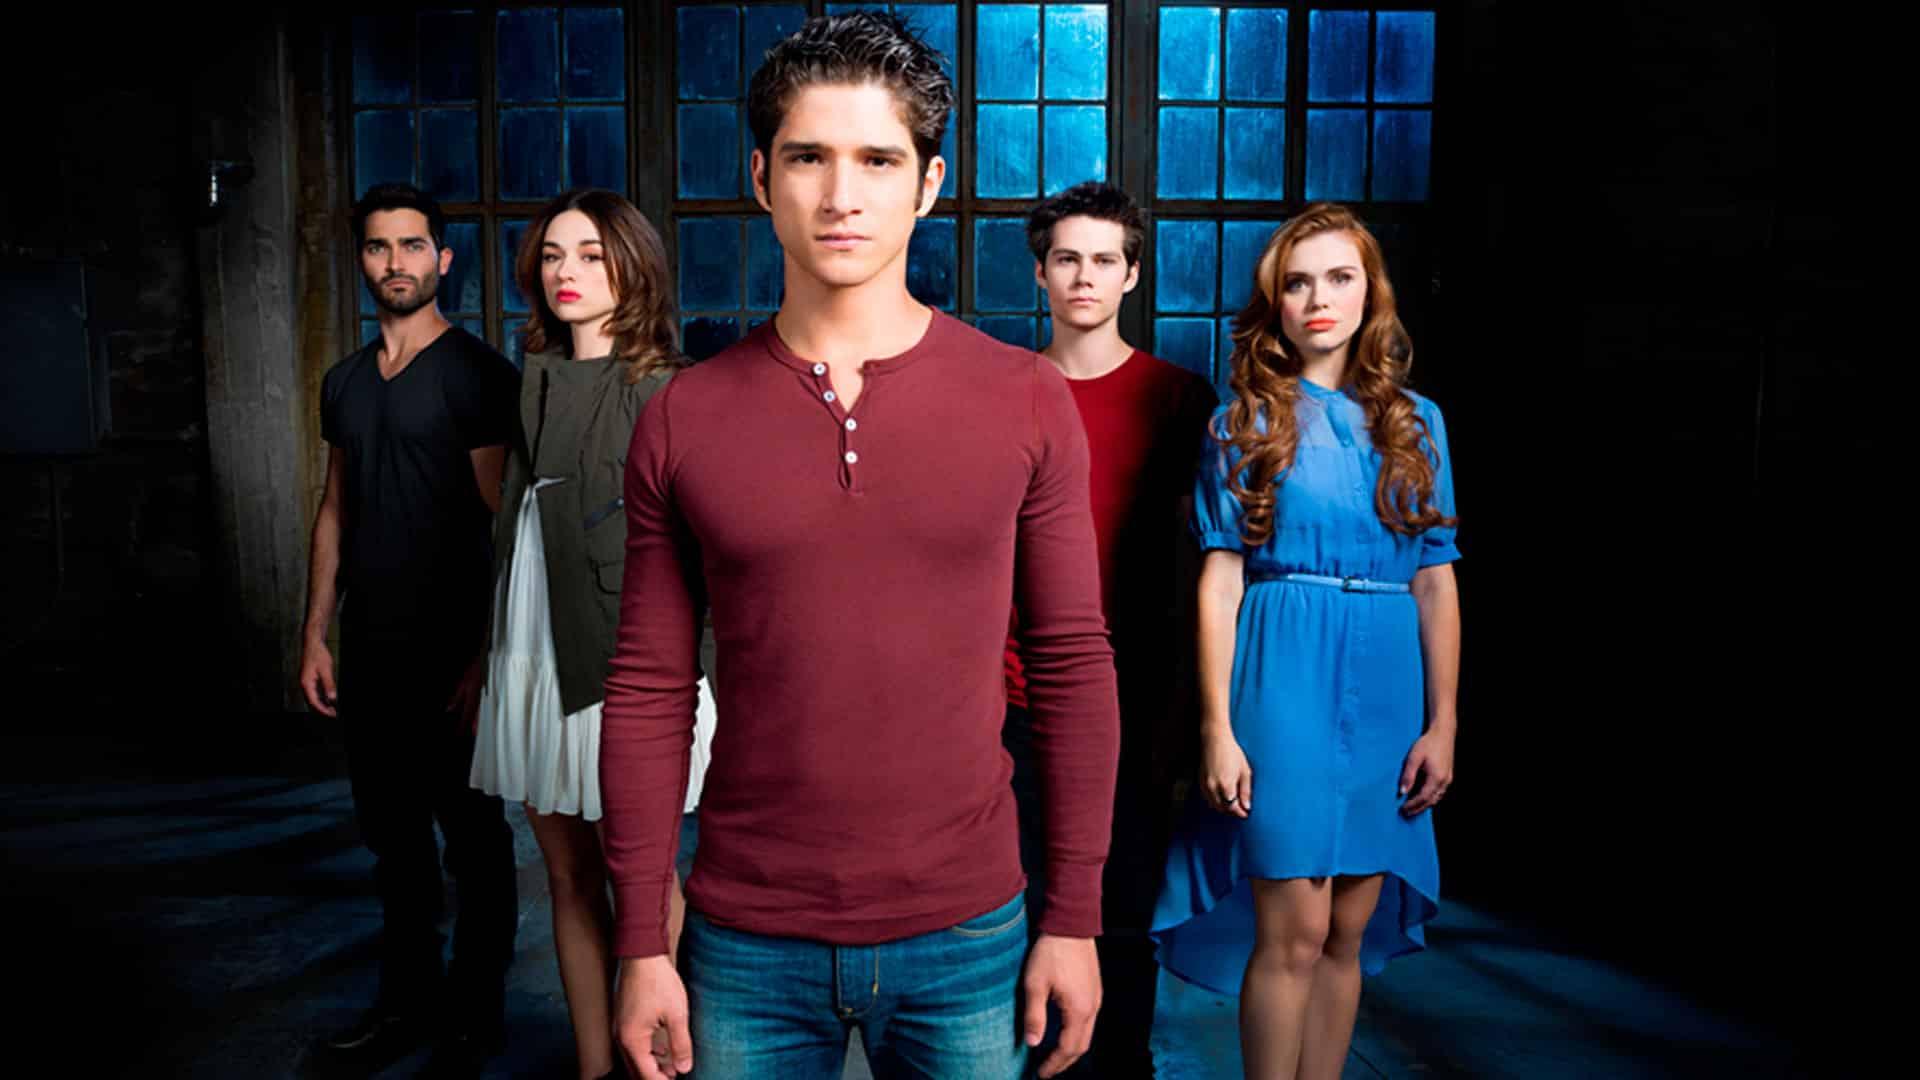 TIP na seriál: Teen Wolf | Príbeh o vlkolakoch, banshee, a lovcoch bytostí